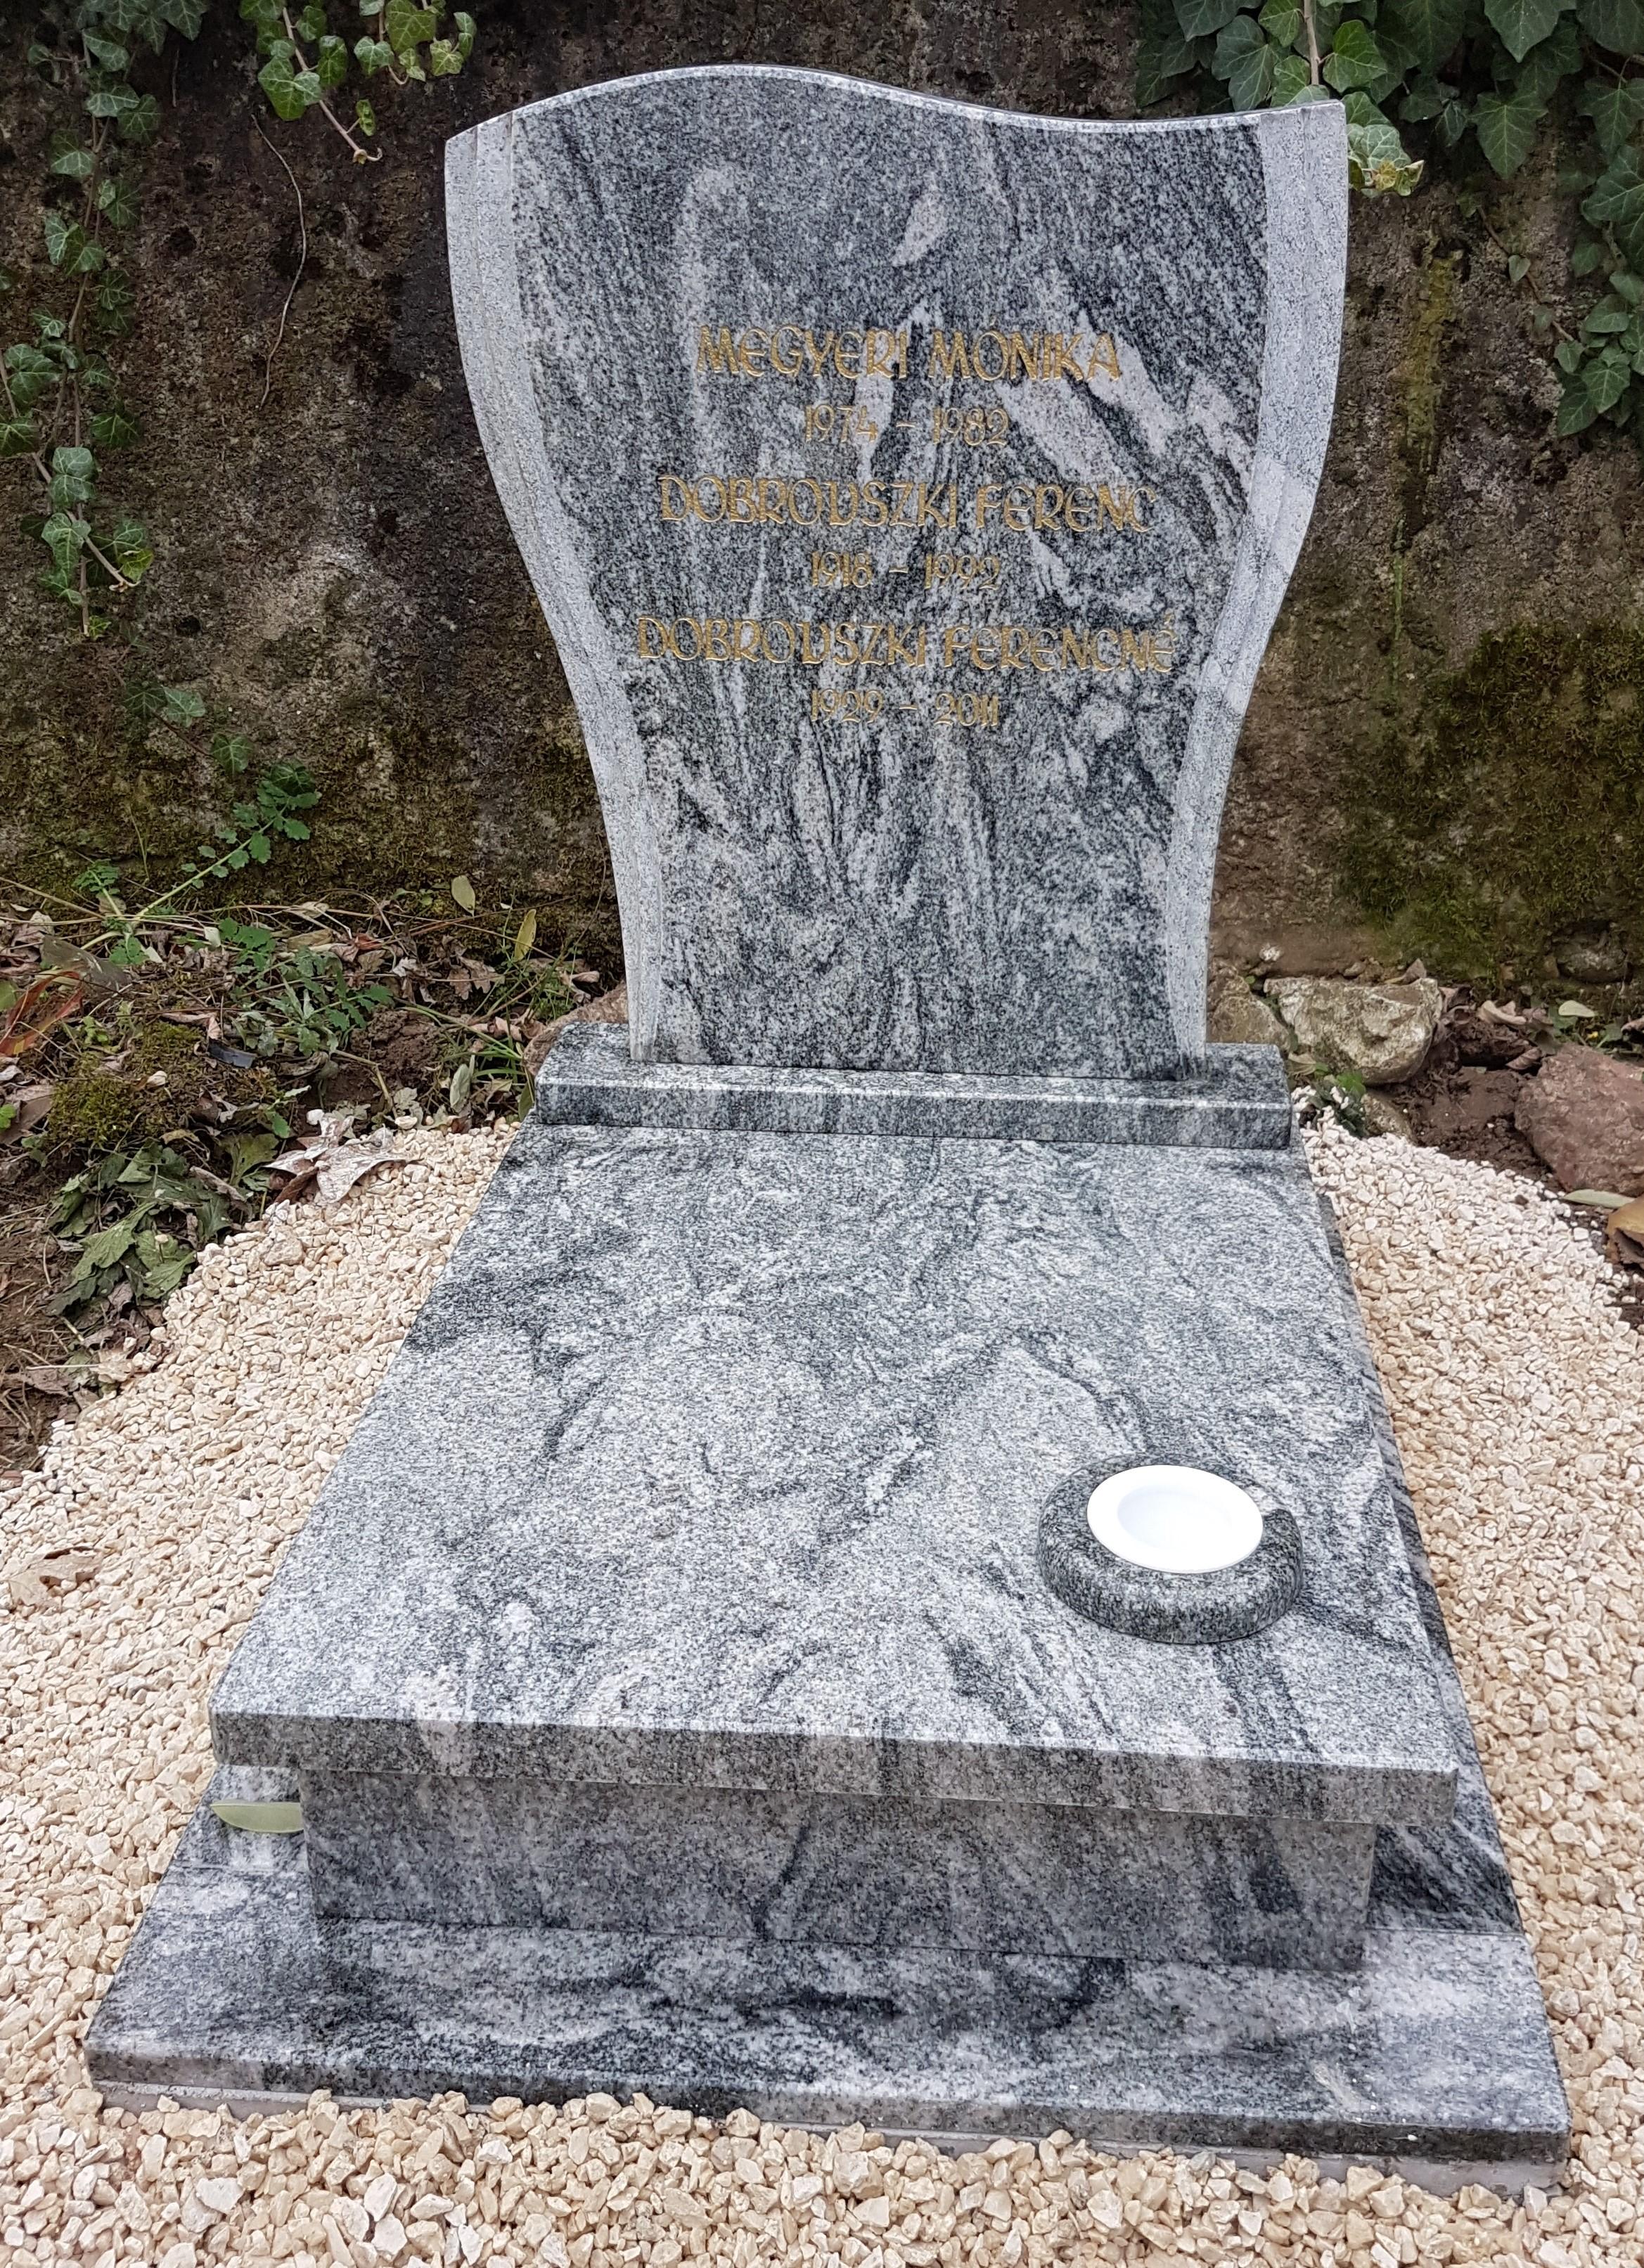 Verede marina gránit urnás síremlék akciós ár 180.000 Ft